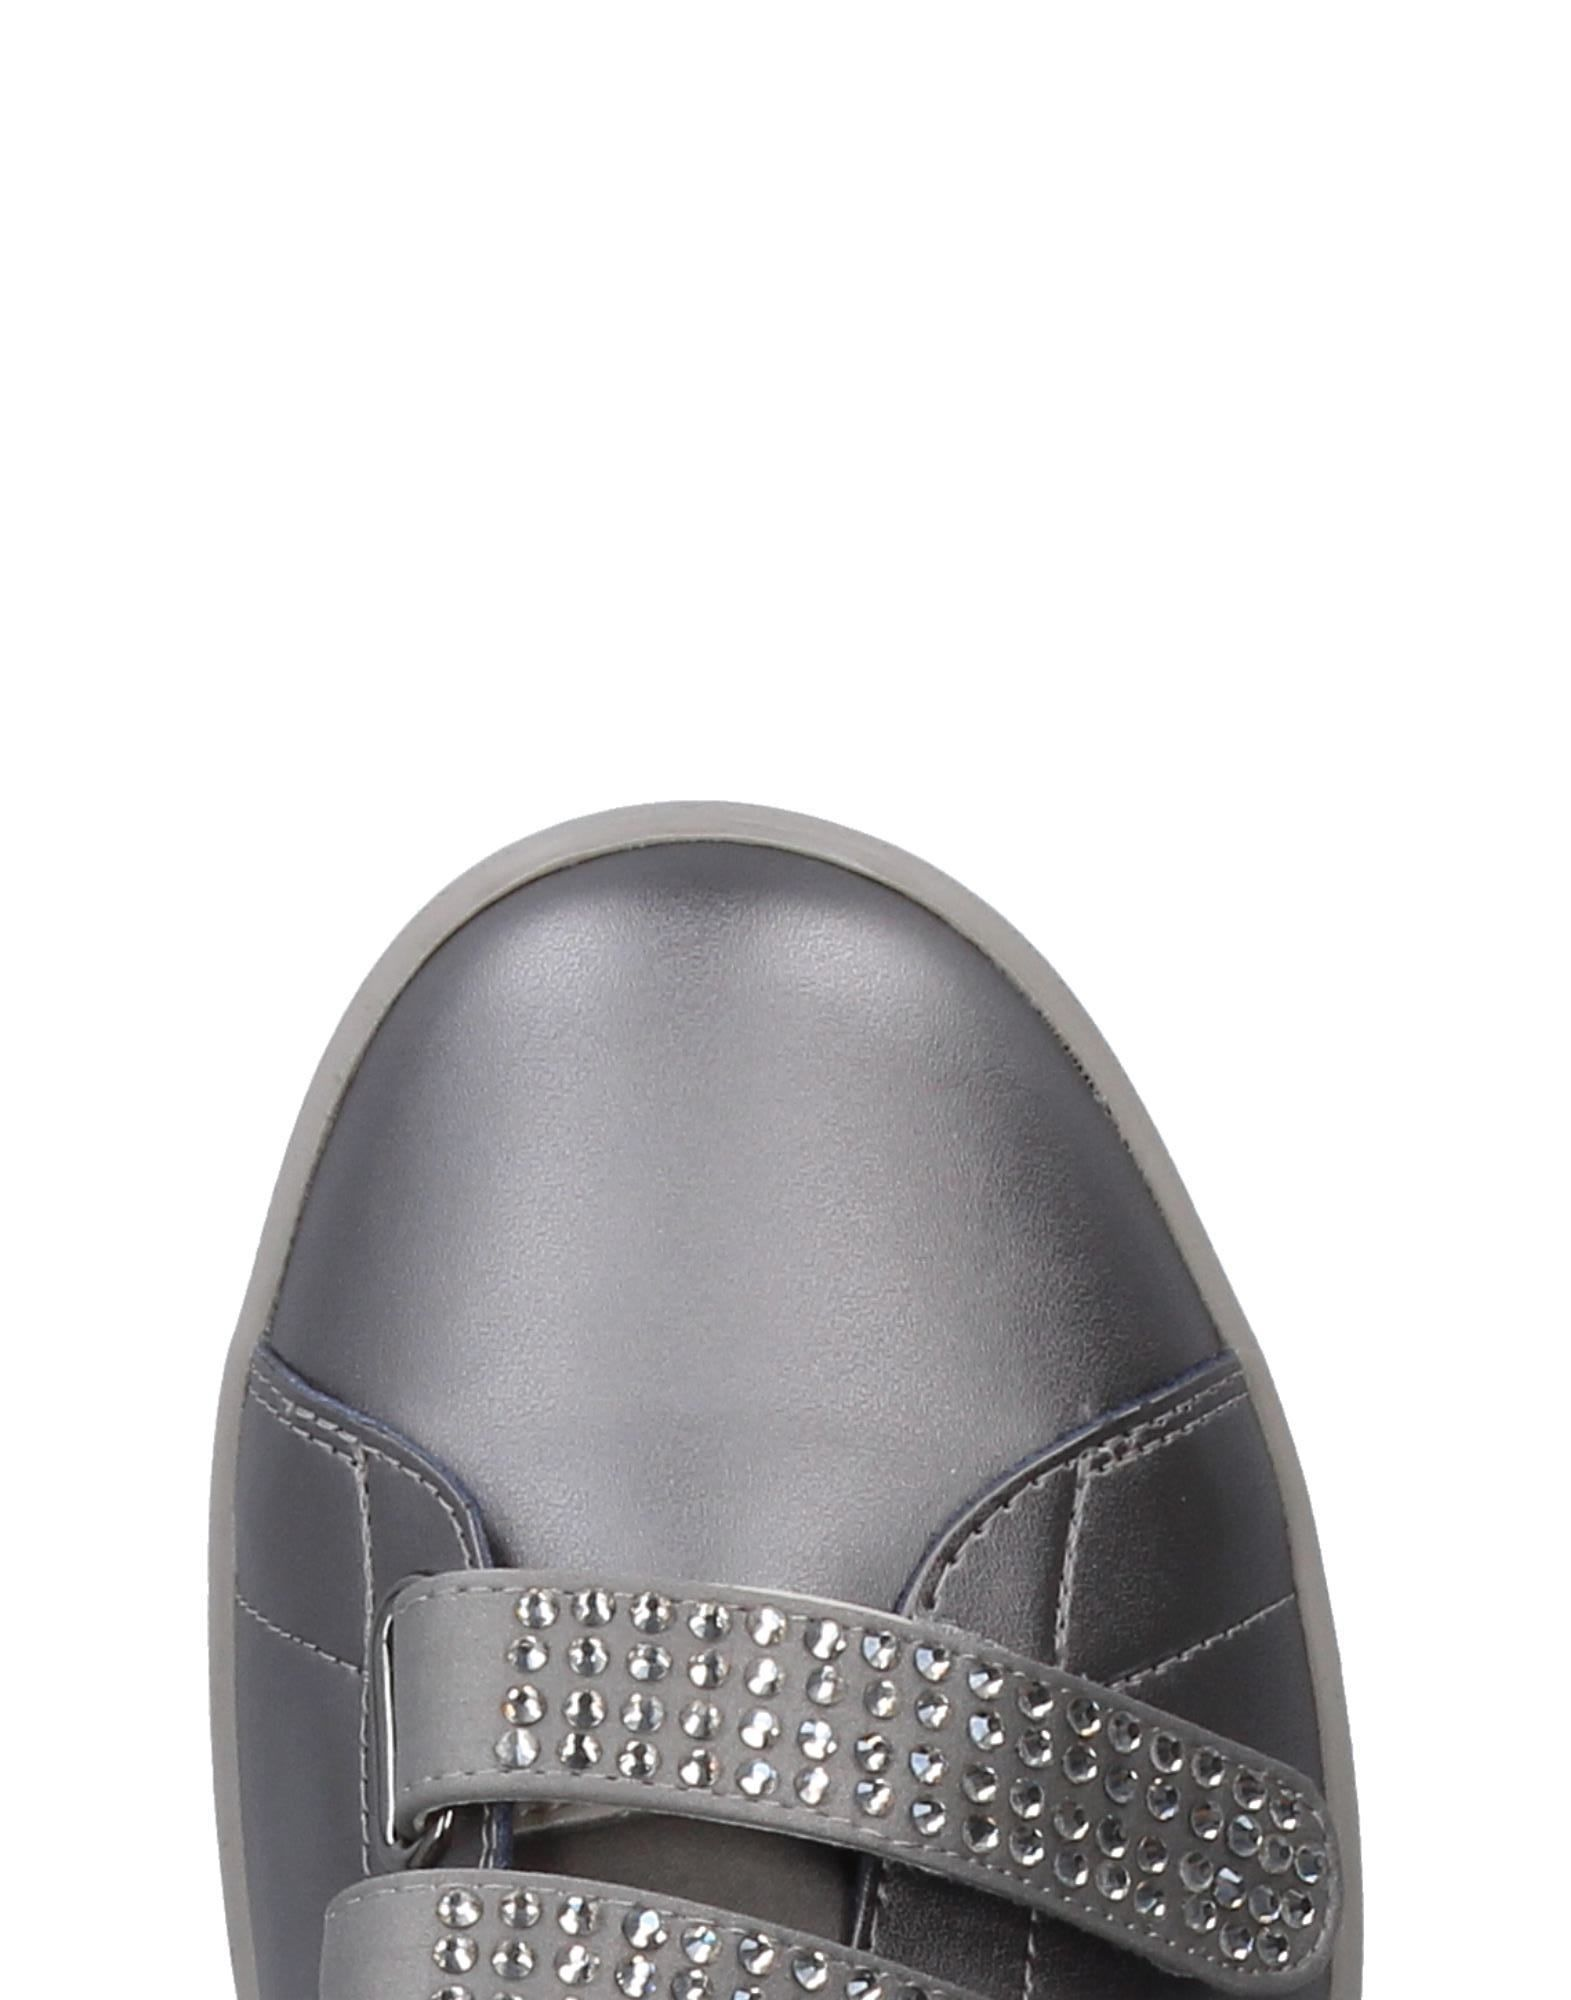 Liu •Jo Shoes Sneakers Damen  11247915DM 11247915DM  Gute Qualität beliebte Schuhe ef6b55